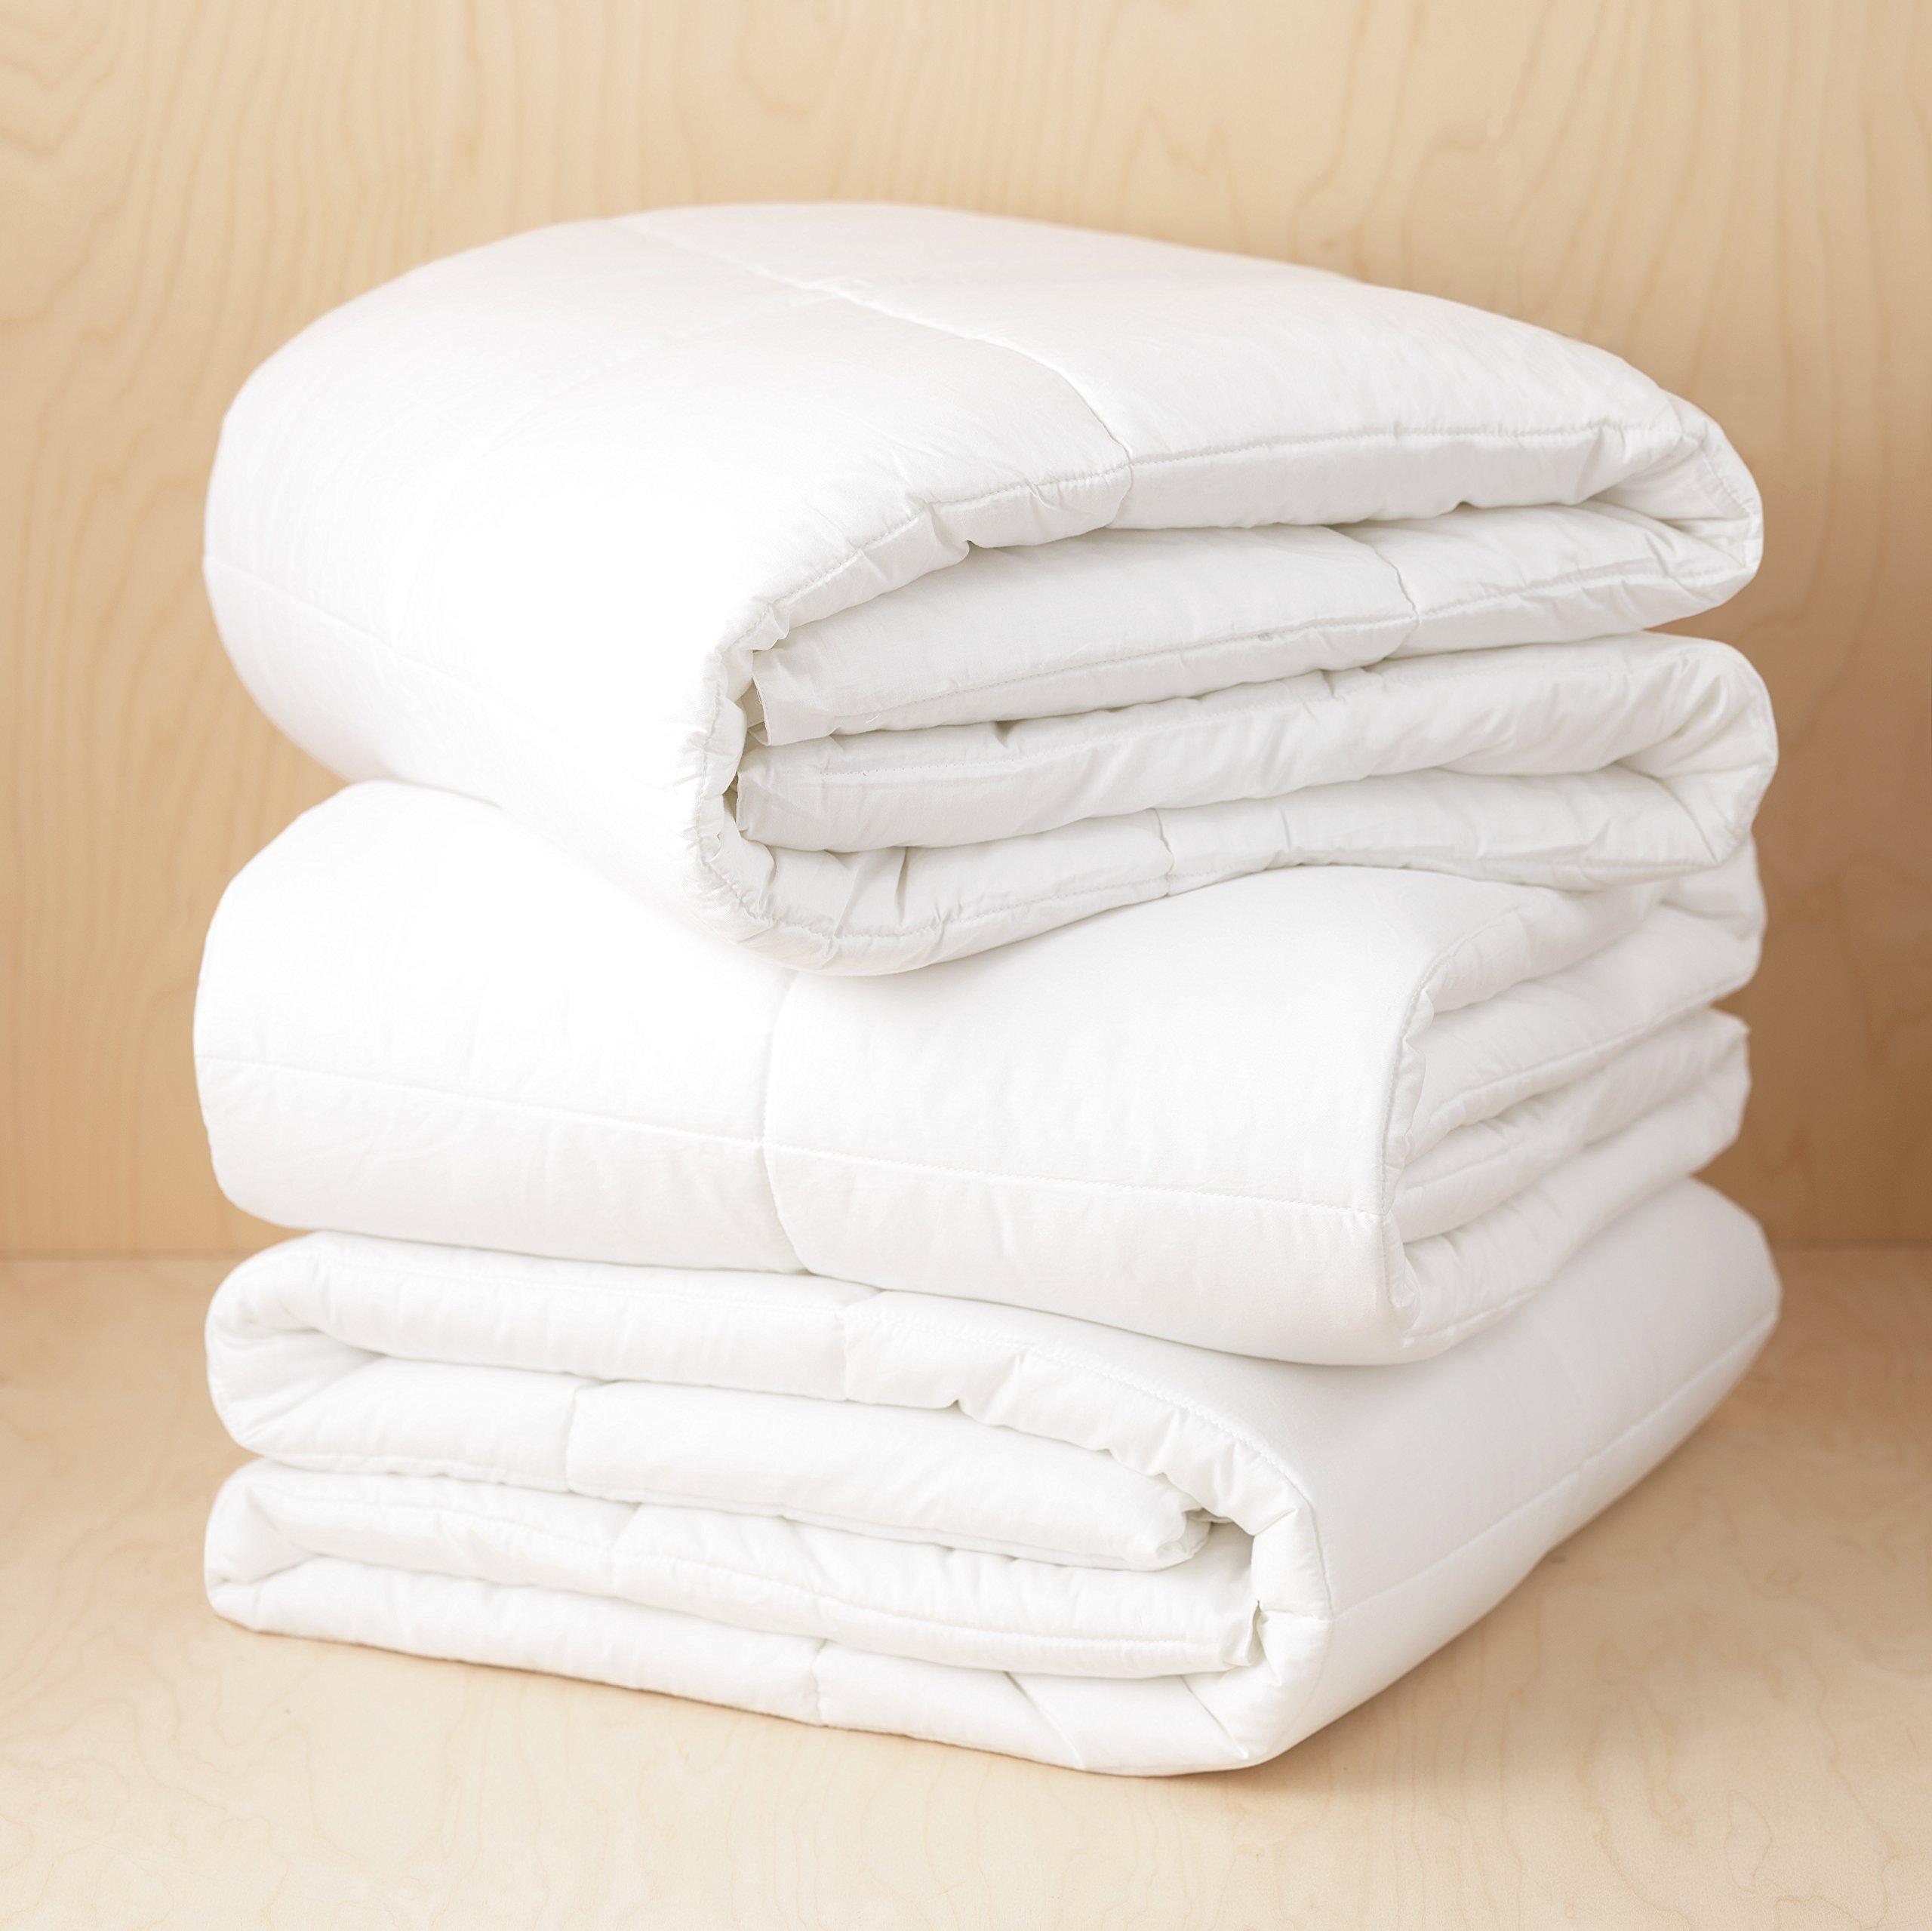 Boxt Teddy Single Ply Cotton Hypo Allergenic Down Alternative Comforter